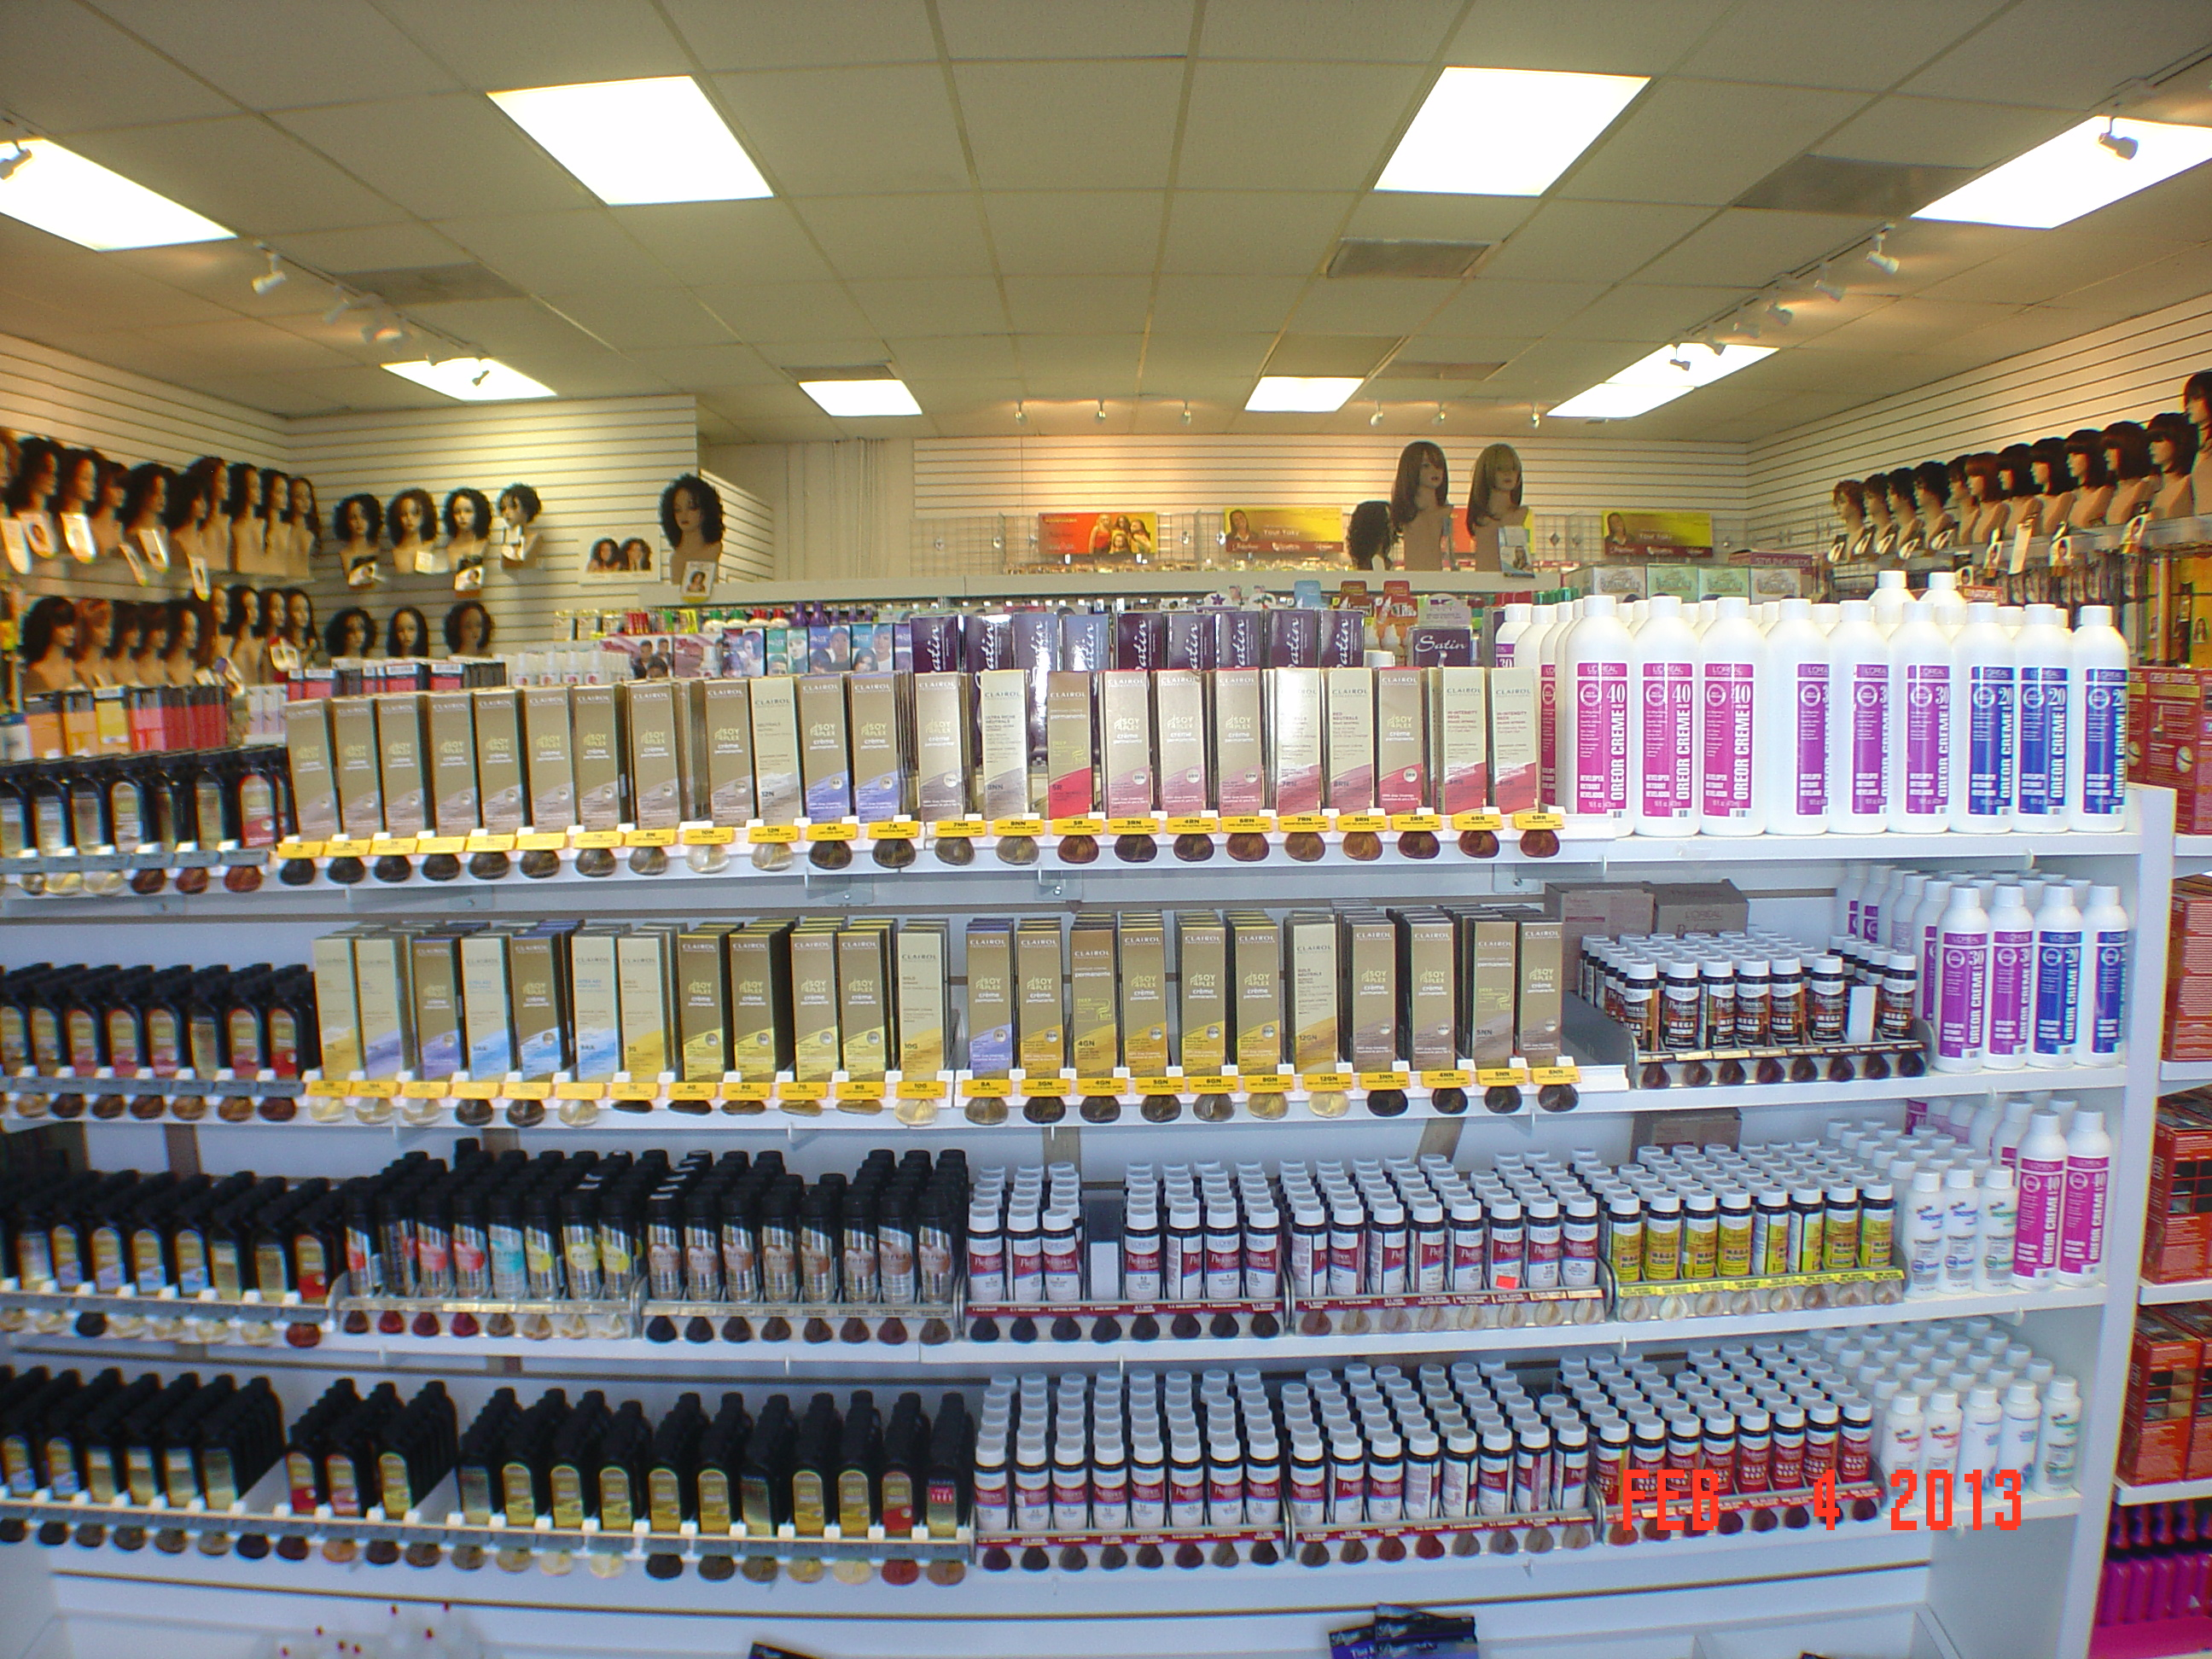 Sam S Hair Beauty Supply 301 E Florida Ave Hemet Ca 92543 Yp Com